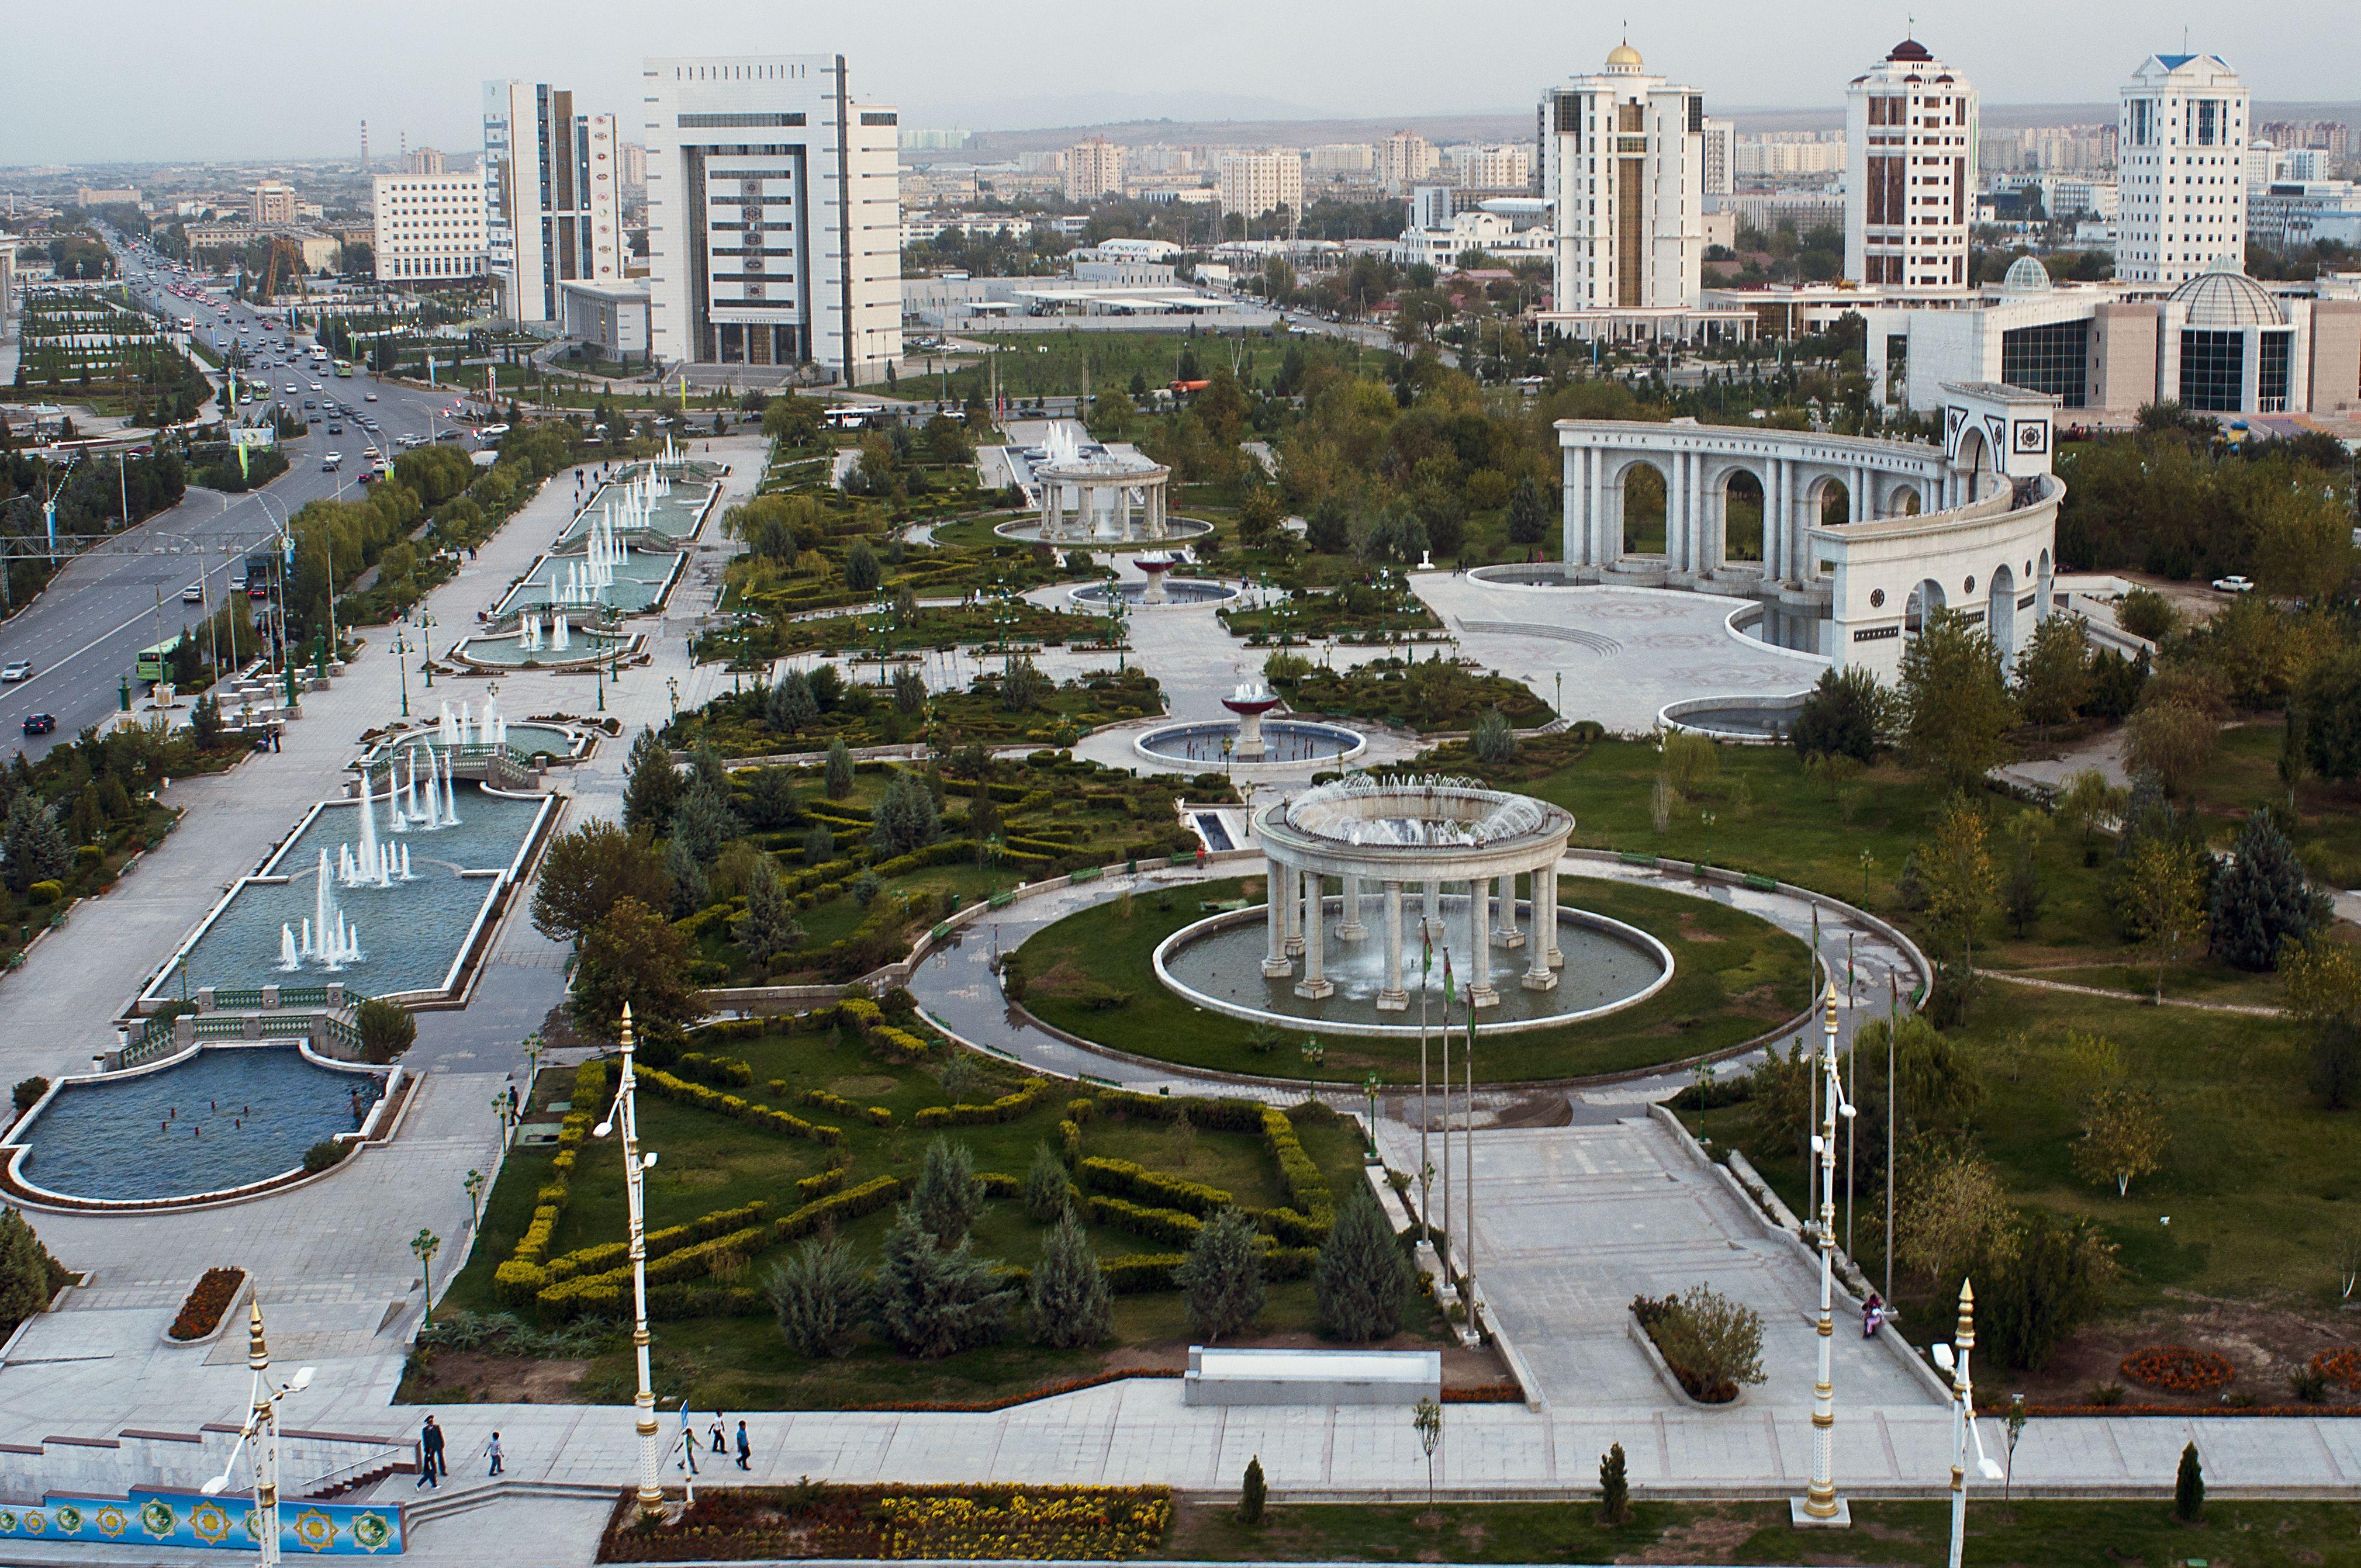 ashgabat - Buscar con Google